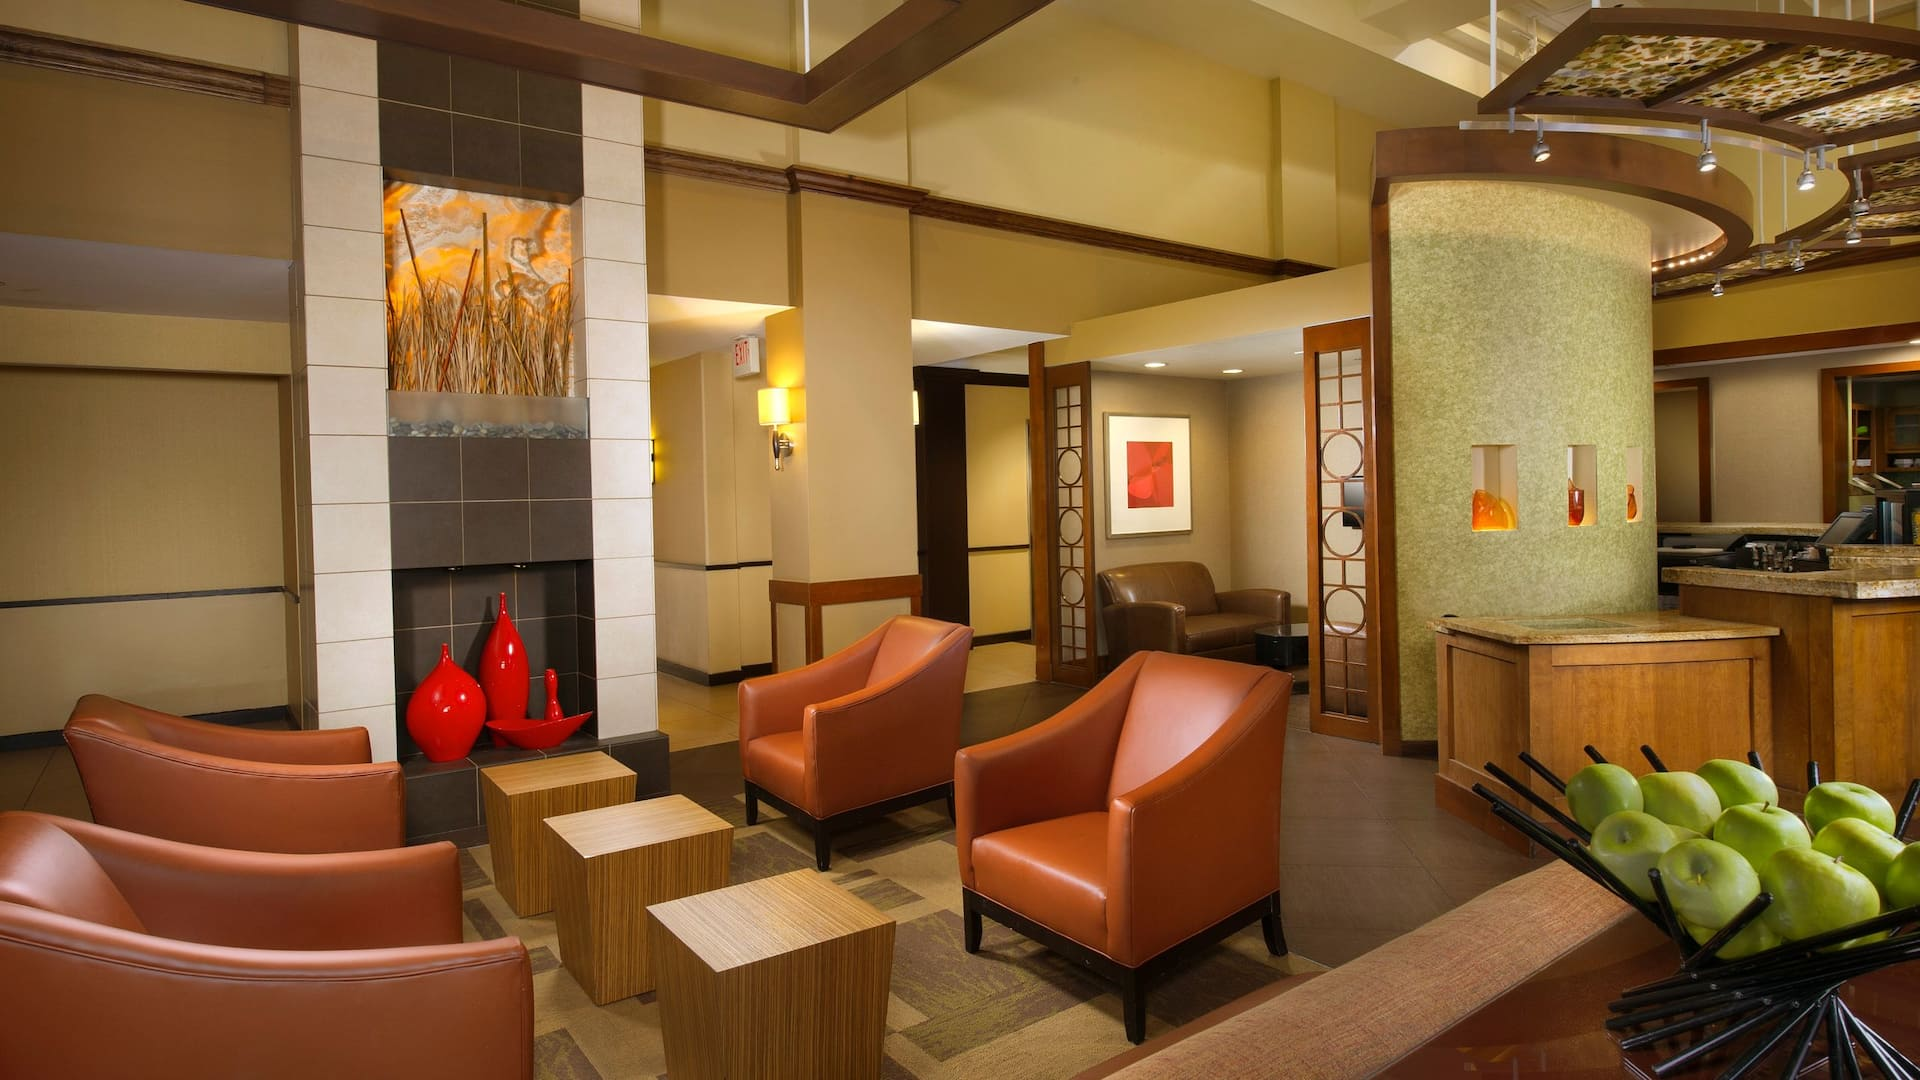 hyatt lobby seating area